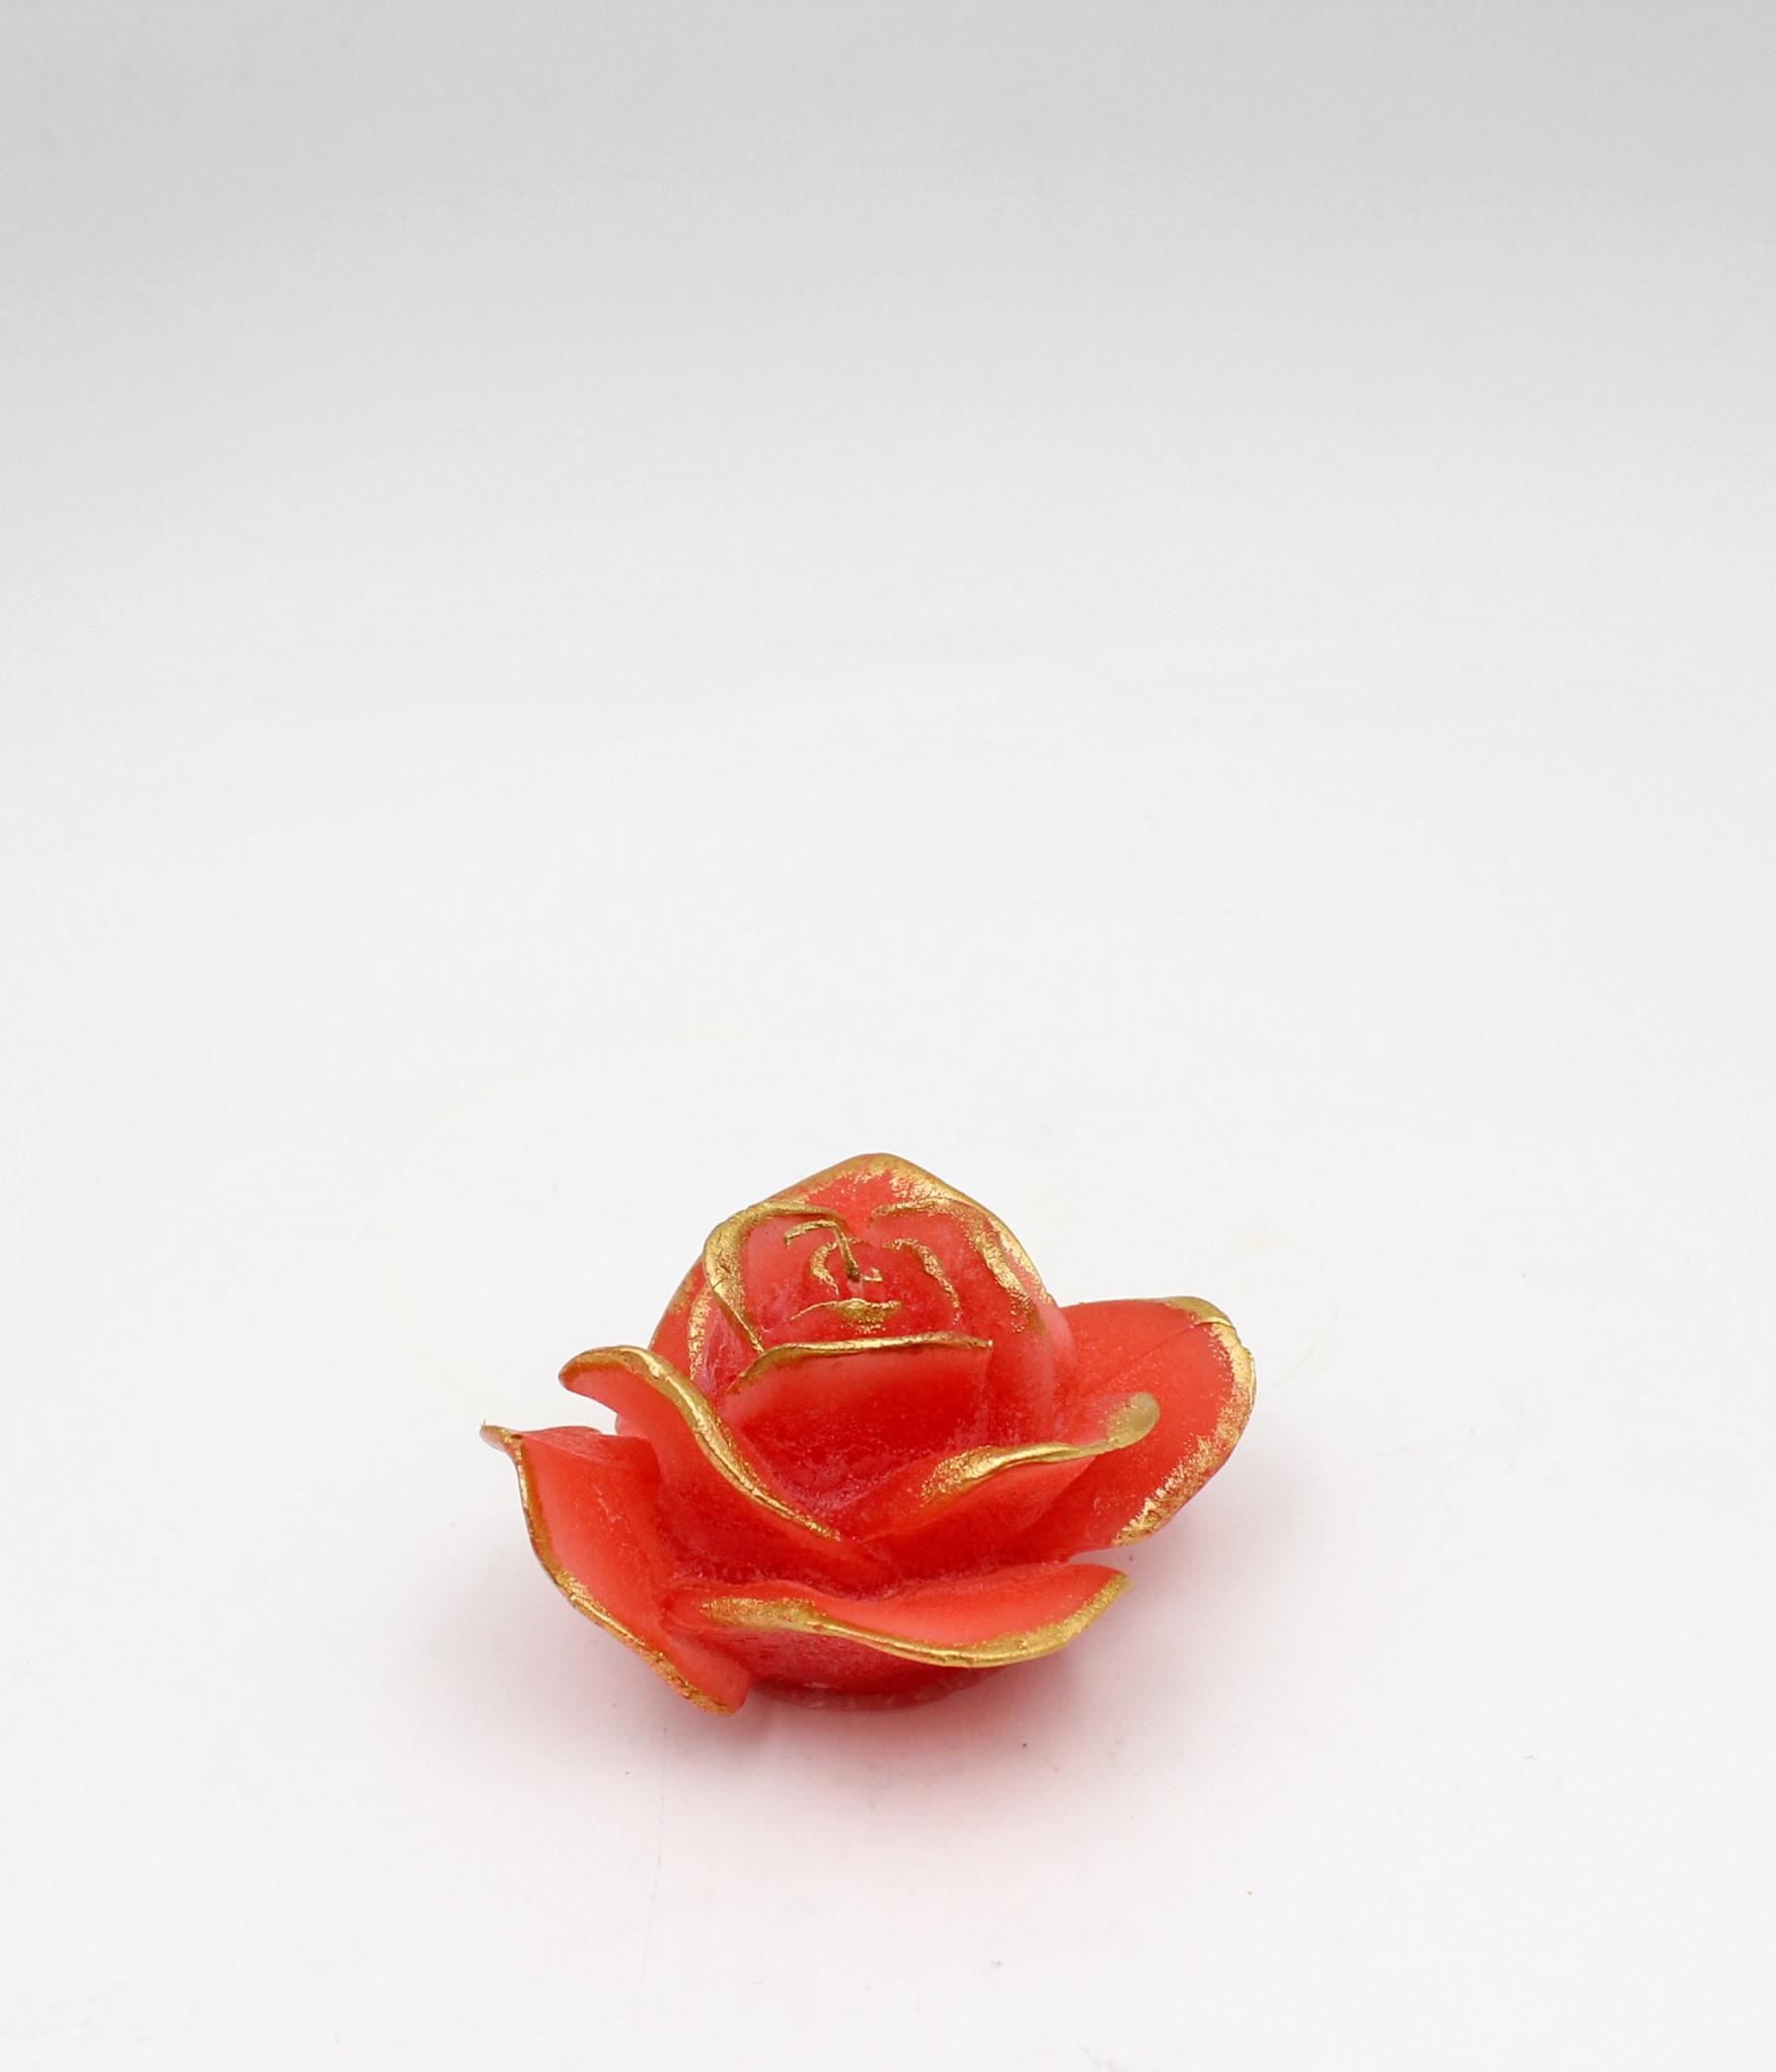 Rosa galleggiante spugnata